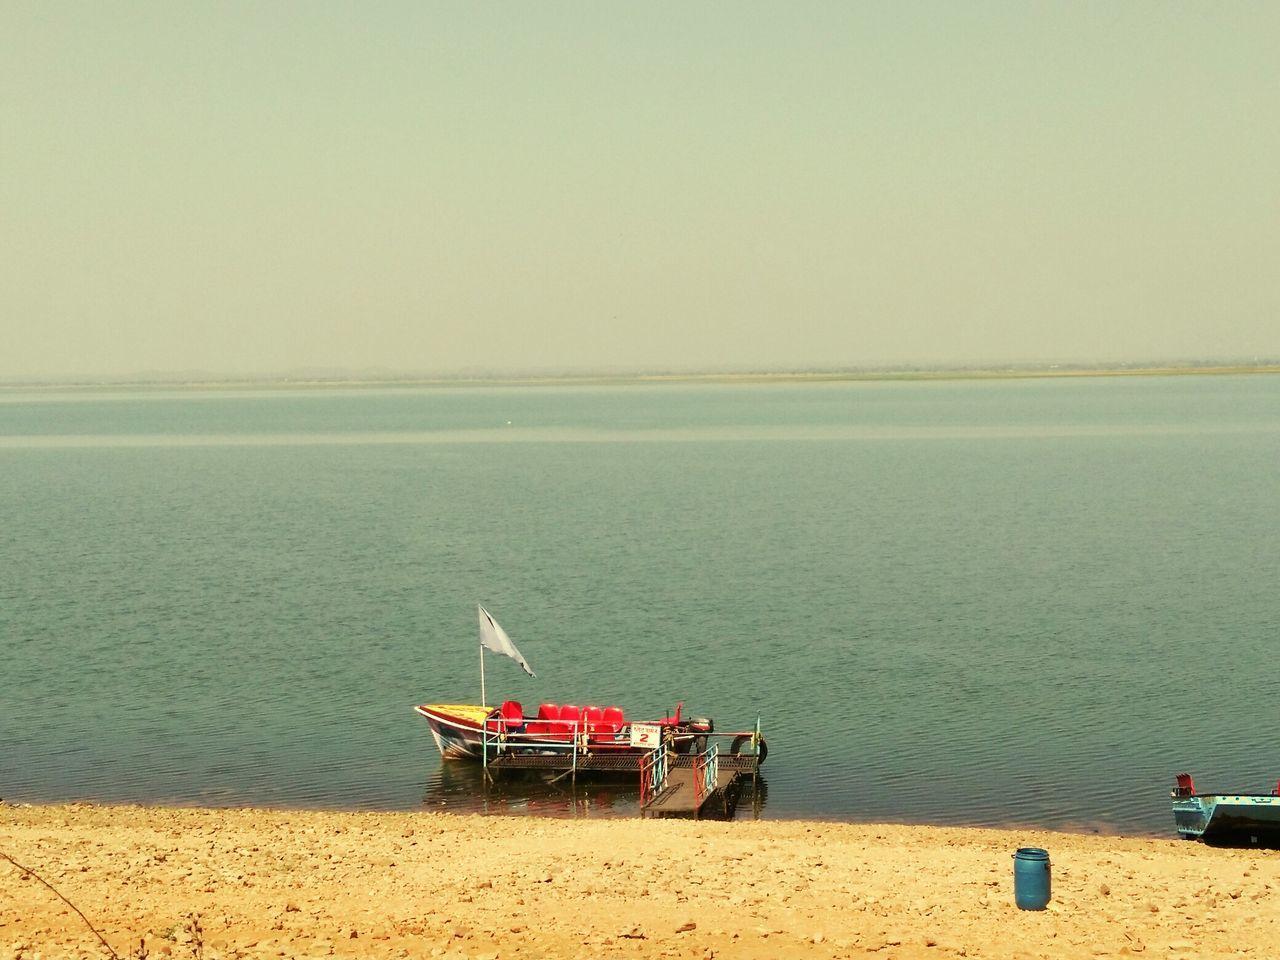 Boat Peace Boats And Water Lake Lakeshore Lake Life Alone Time EyeEm Gallery Eye4photography  EyeEm Best Shots EyeEm Nature Lover EyeEm Best Shots - Nature Khindsi Nagpur India EyeEmNewHere